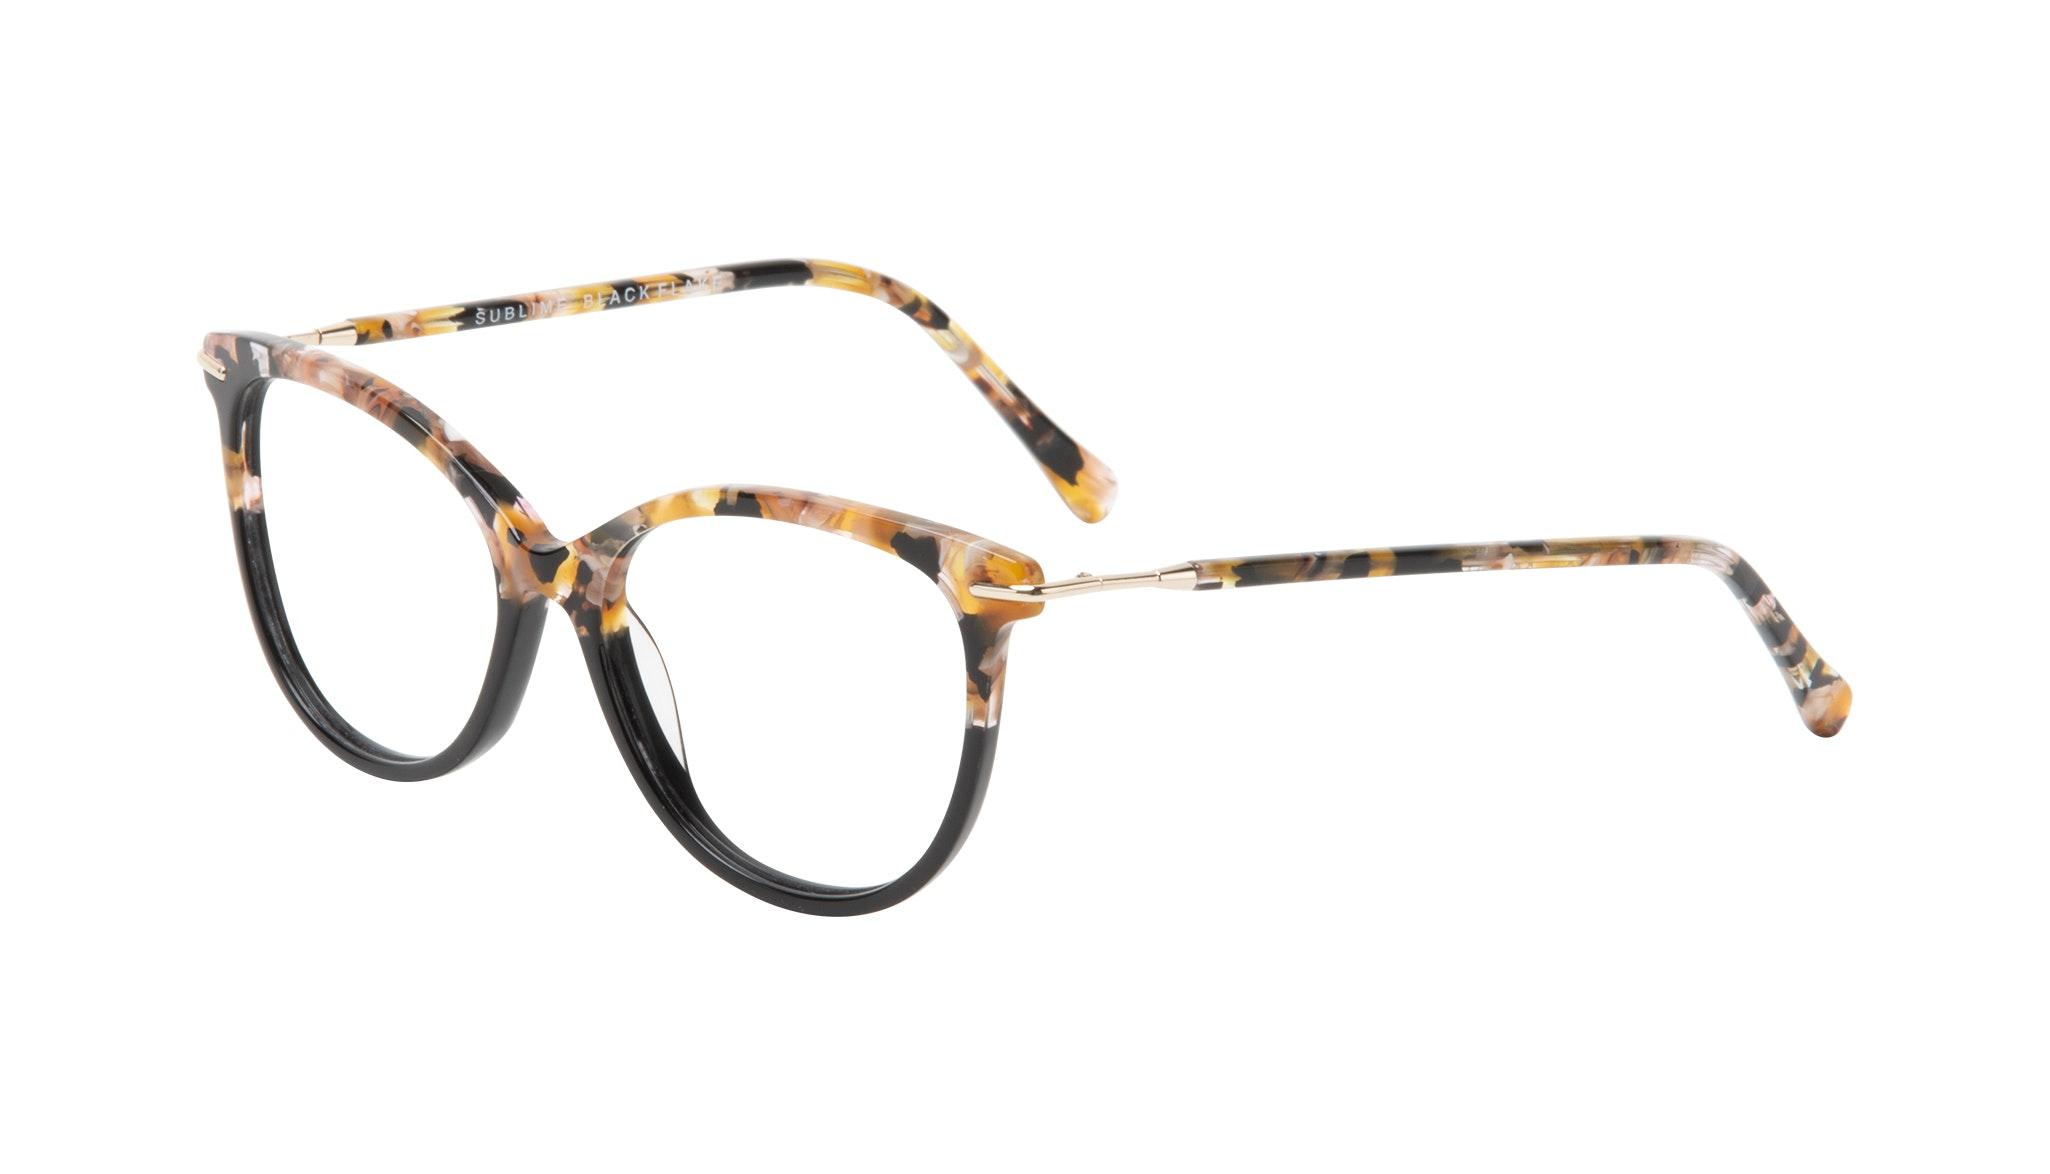 Affordable Fashion Glasses Round Eyeglasses Women Sublime Black Flake Tilt